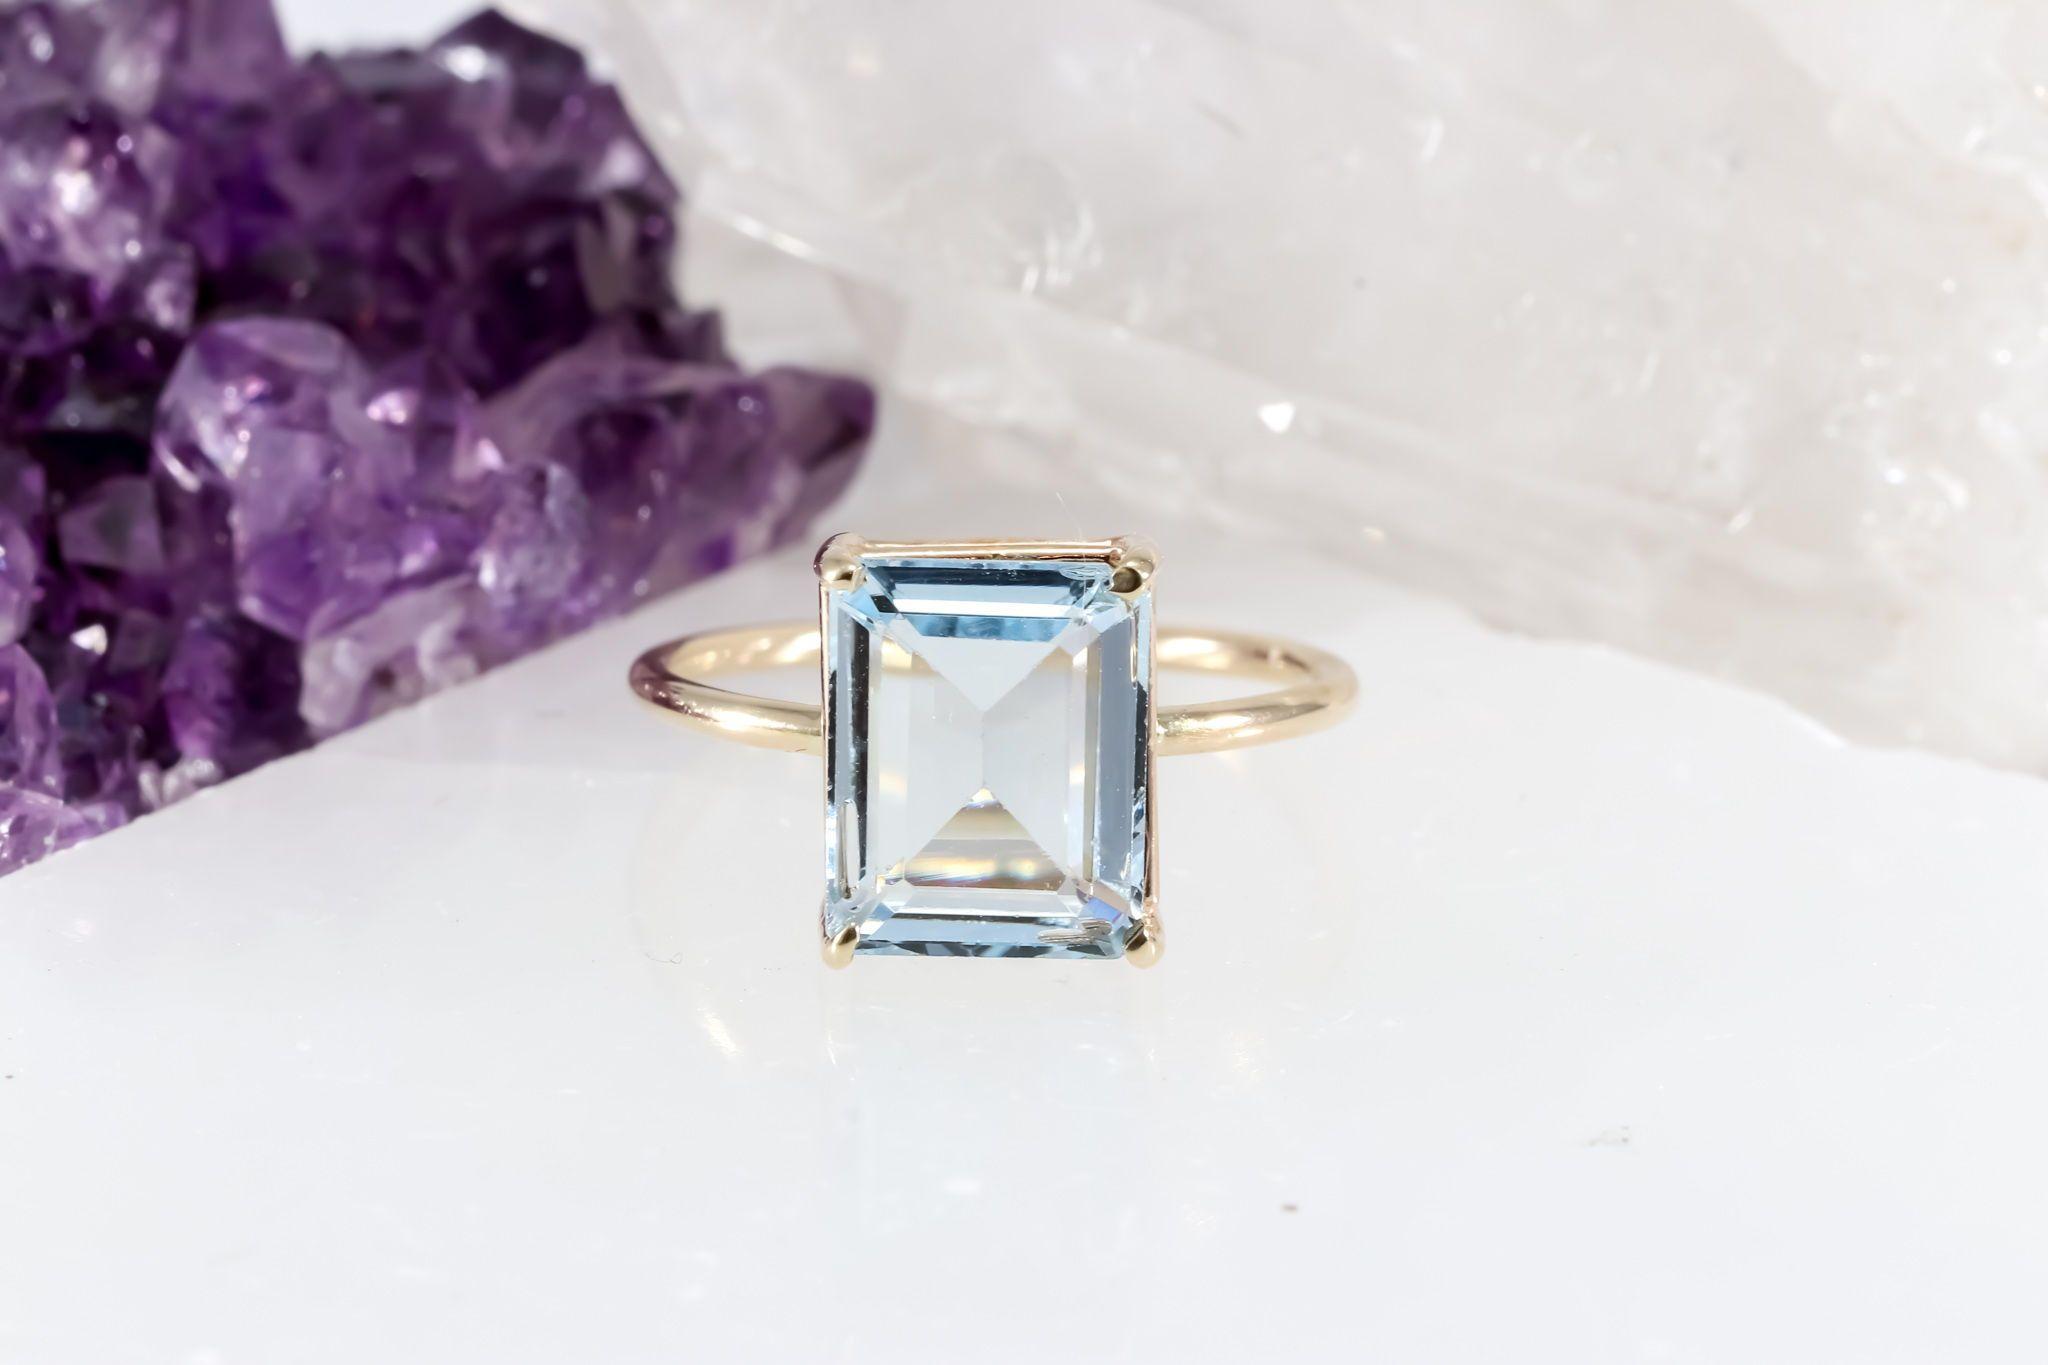 Pin on Estelle M Jewelry